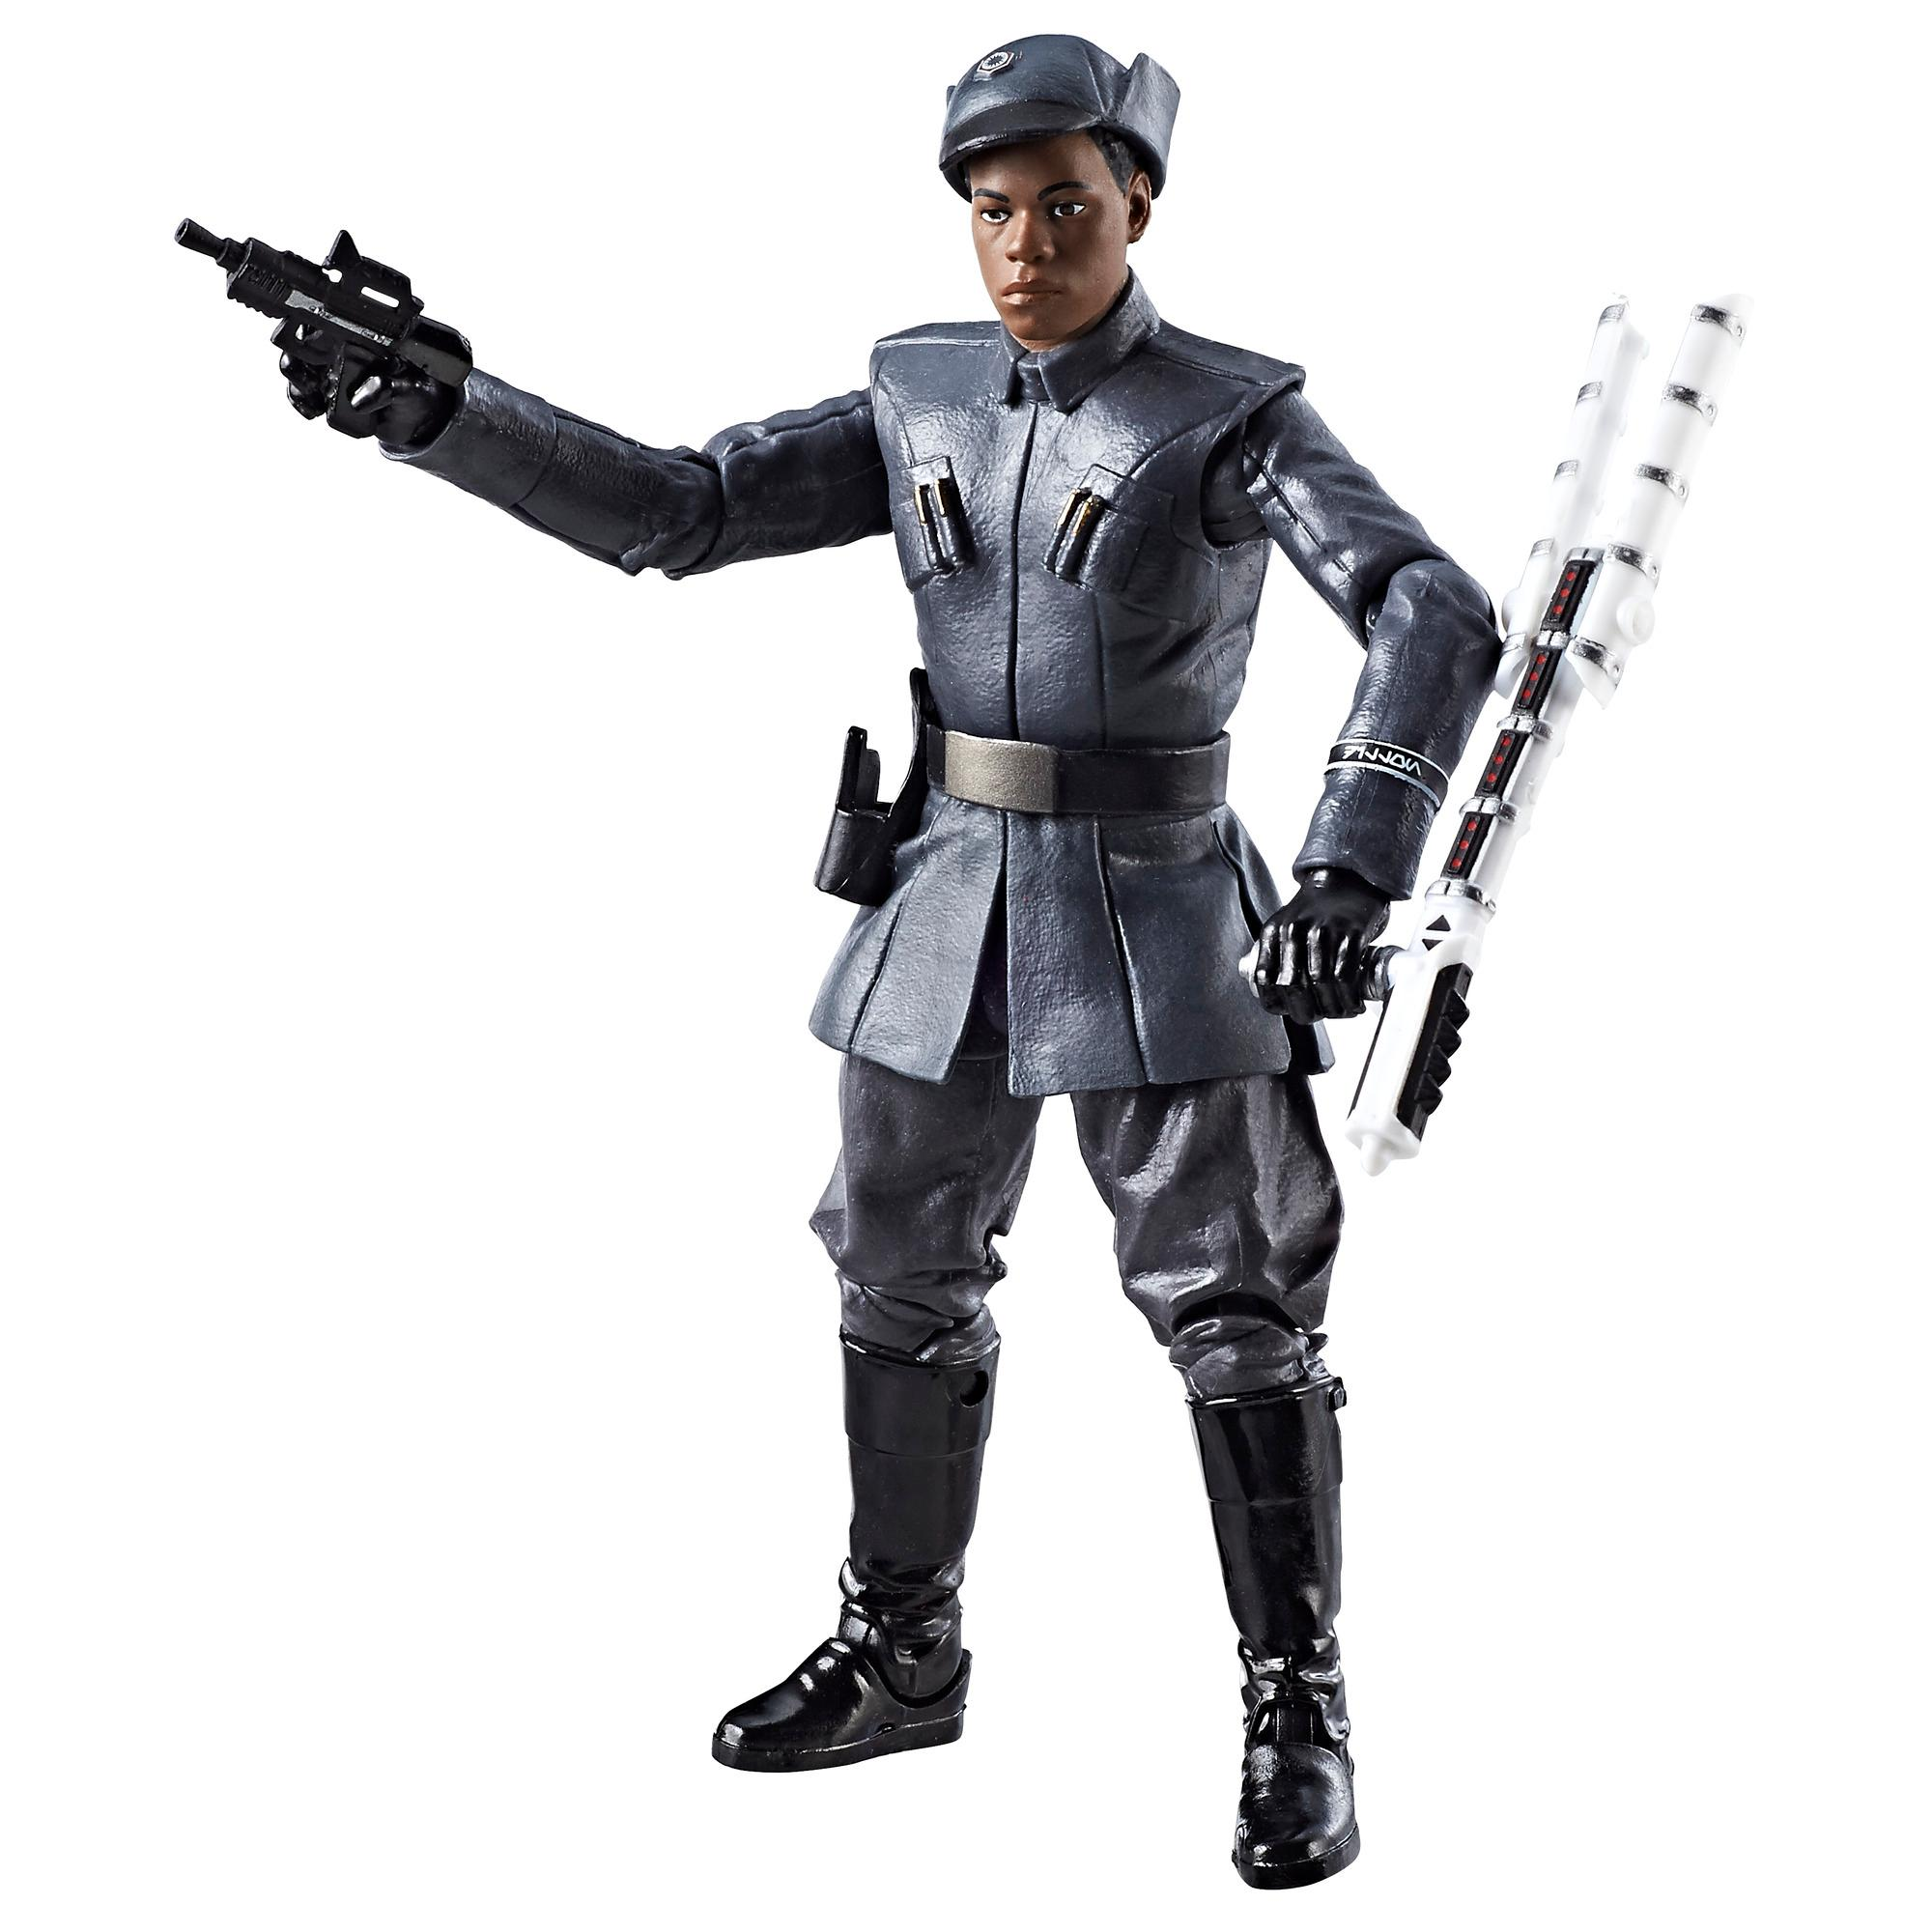 Star Wars The Black Series Finn (First Order Disguise)